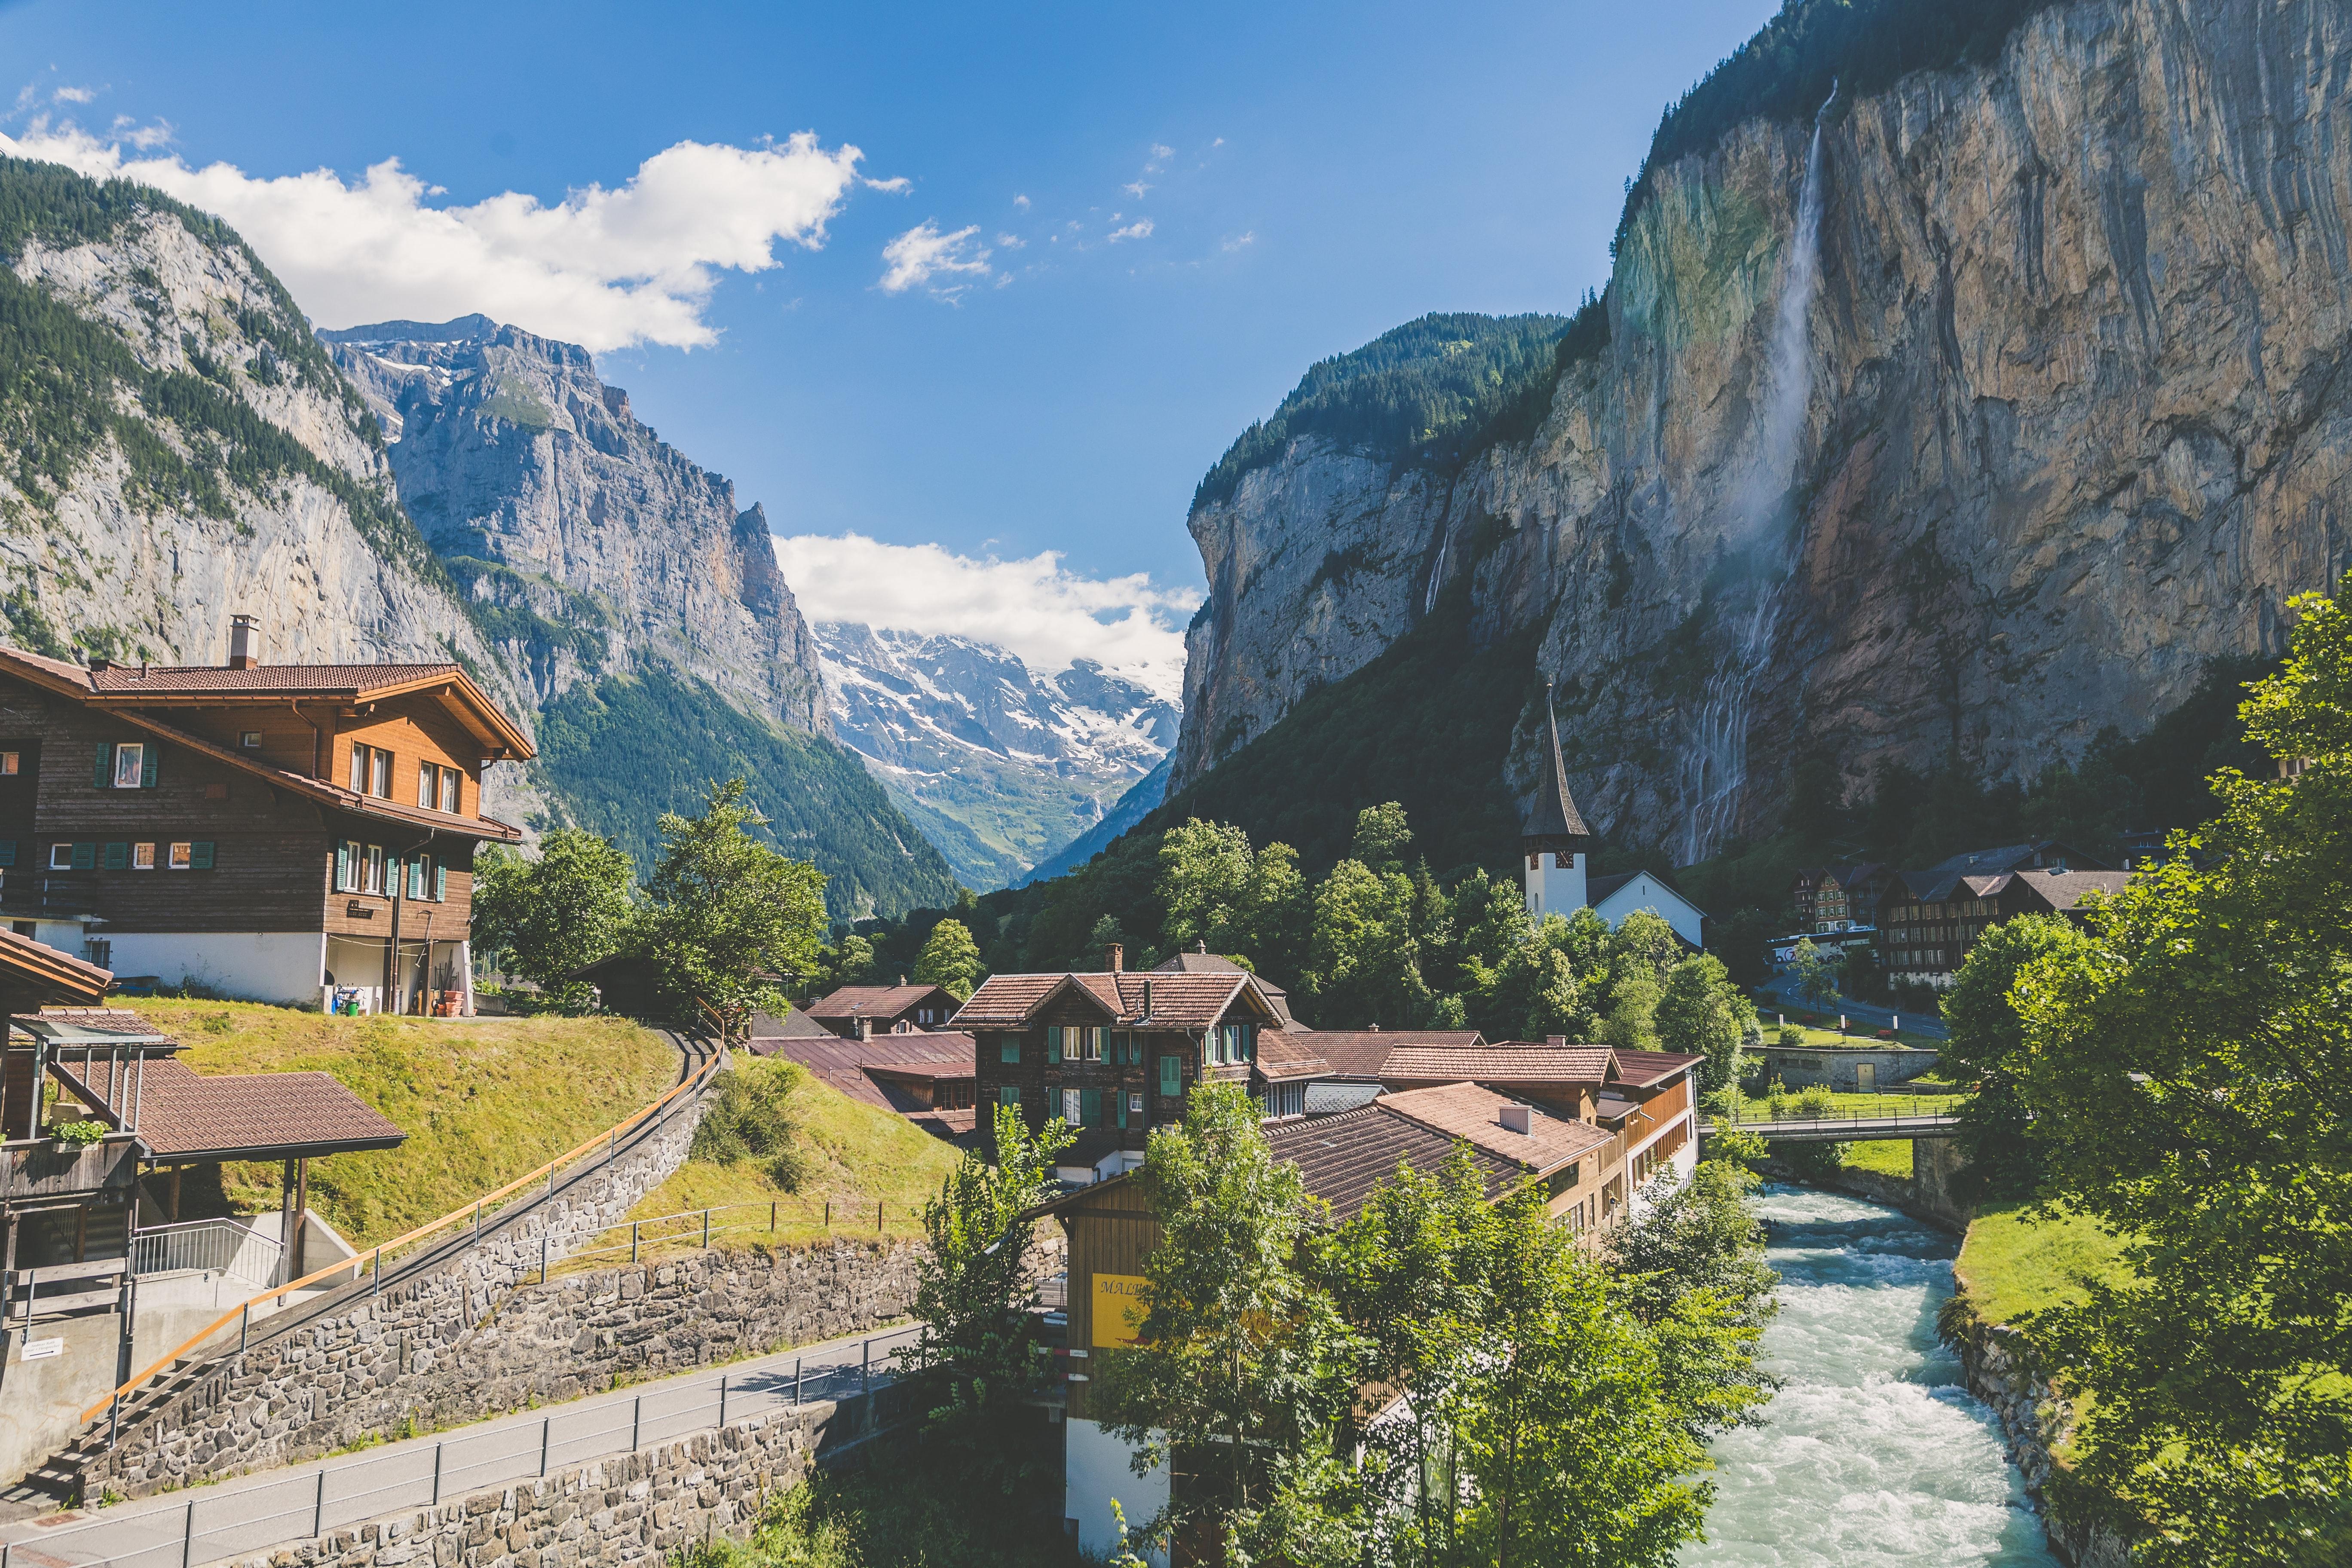 10 most beautiful castles in Switzerland